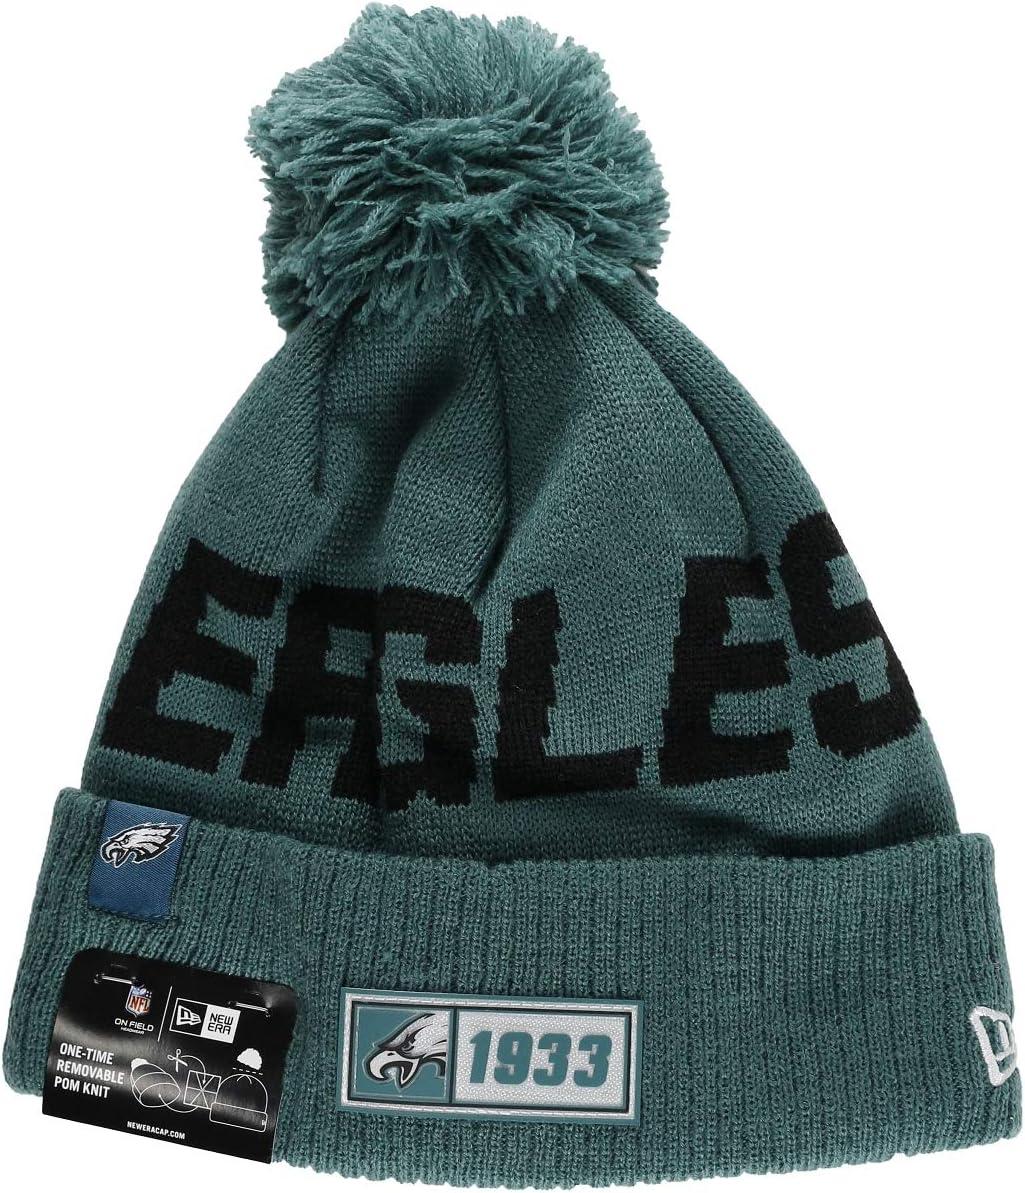 New Era Philadelphia Eagles Beanie Knit NFL 2019 On Field Road 1933